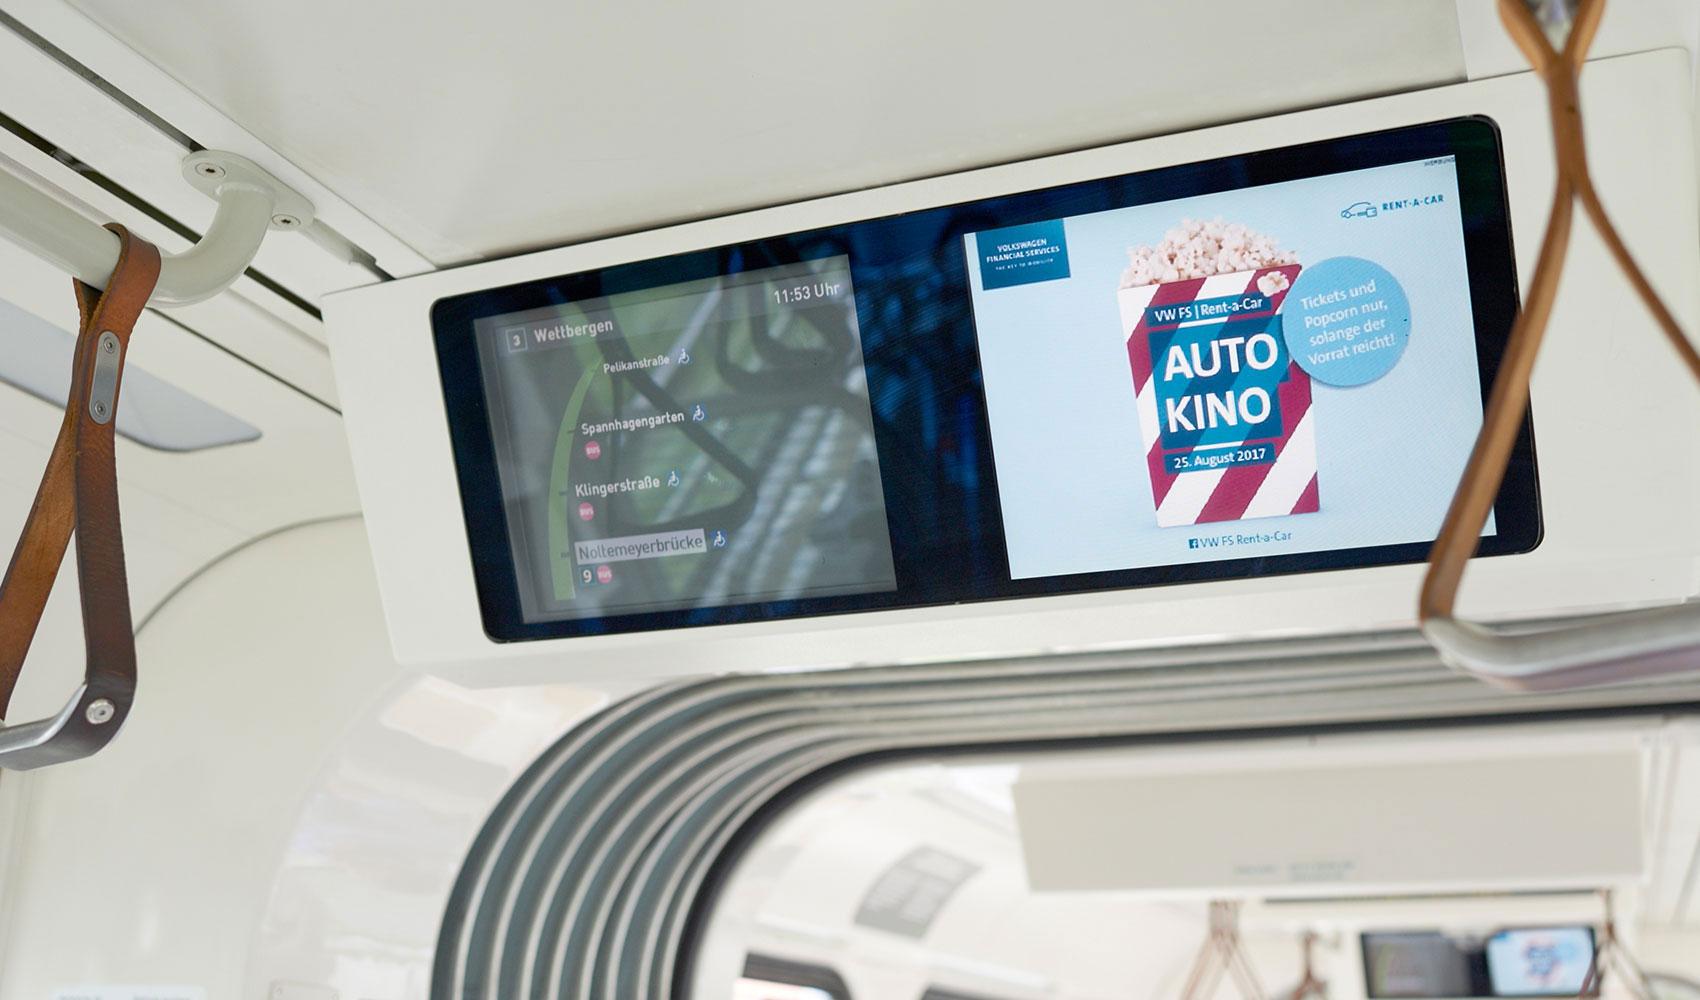 VWFS Rent-a-Car Autokino Bildschirmwerbung Straßenbahn